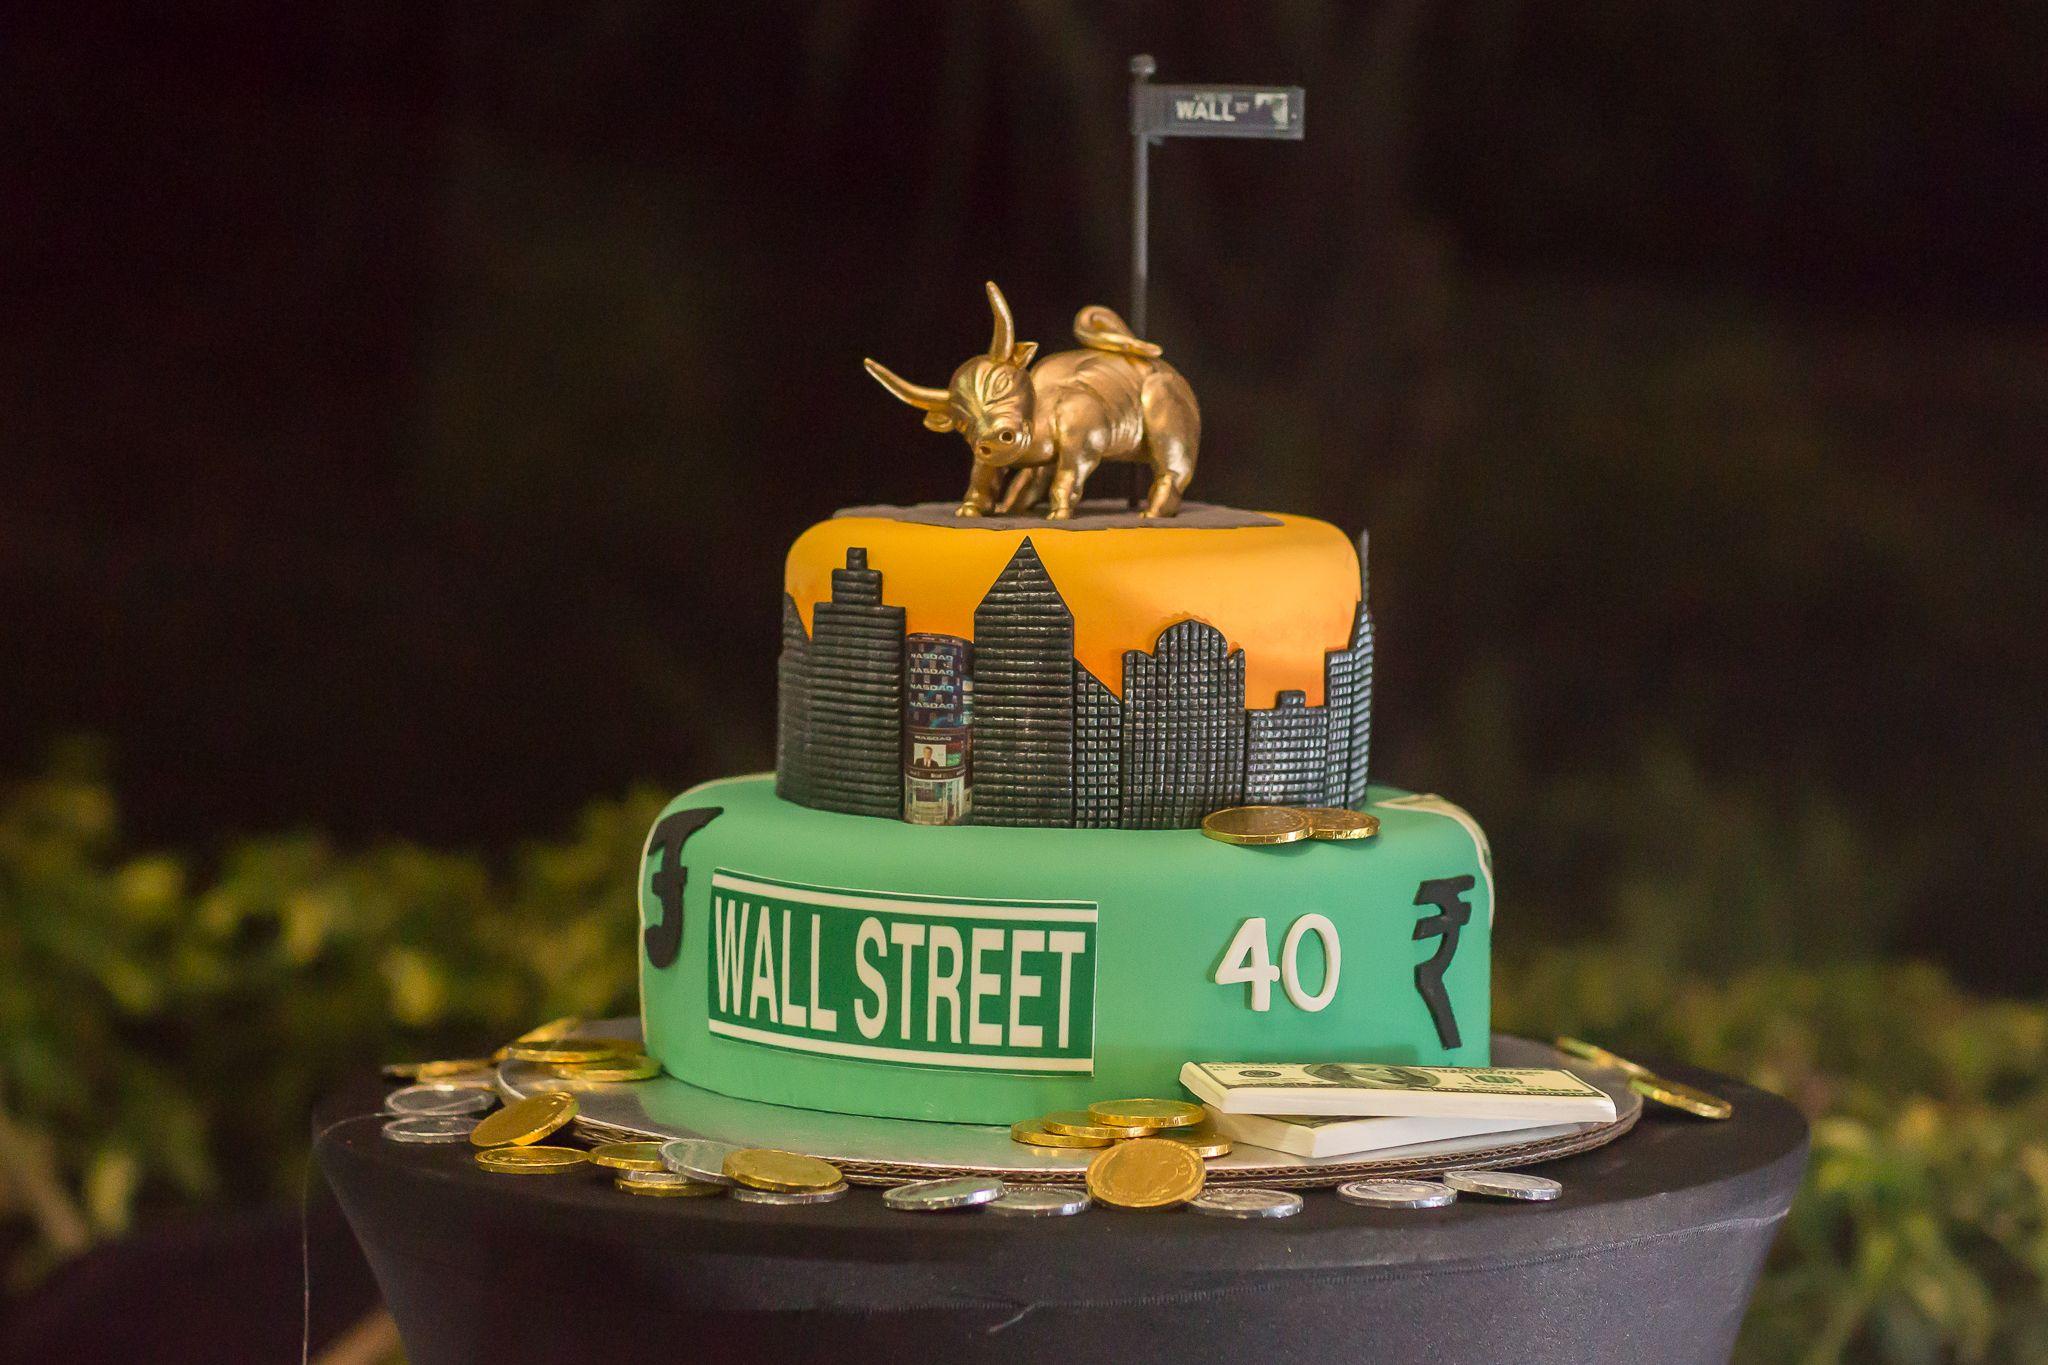 Stock Market Cake Ana Calvo Fotografia Kiefoto